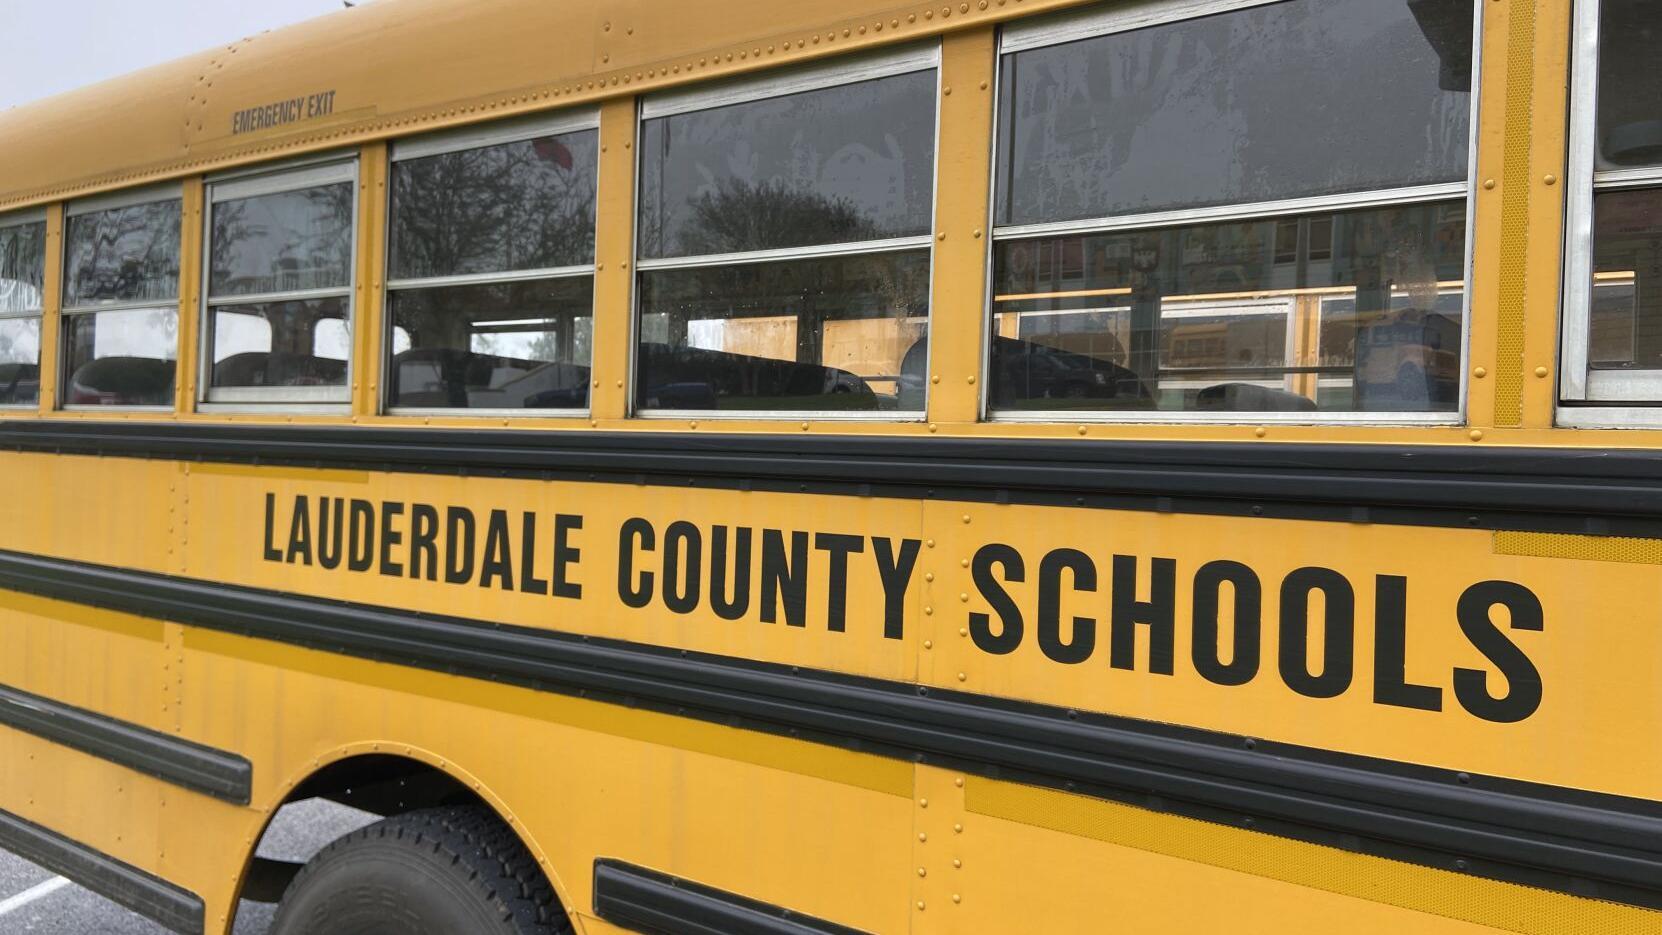 Lauderdale County Schools Calendar 2021-2022 Lauderdale County schools approve 2021 2022 calendar   Local News